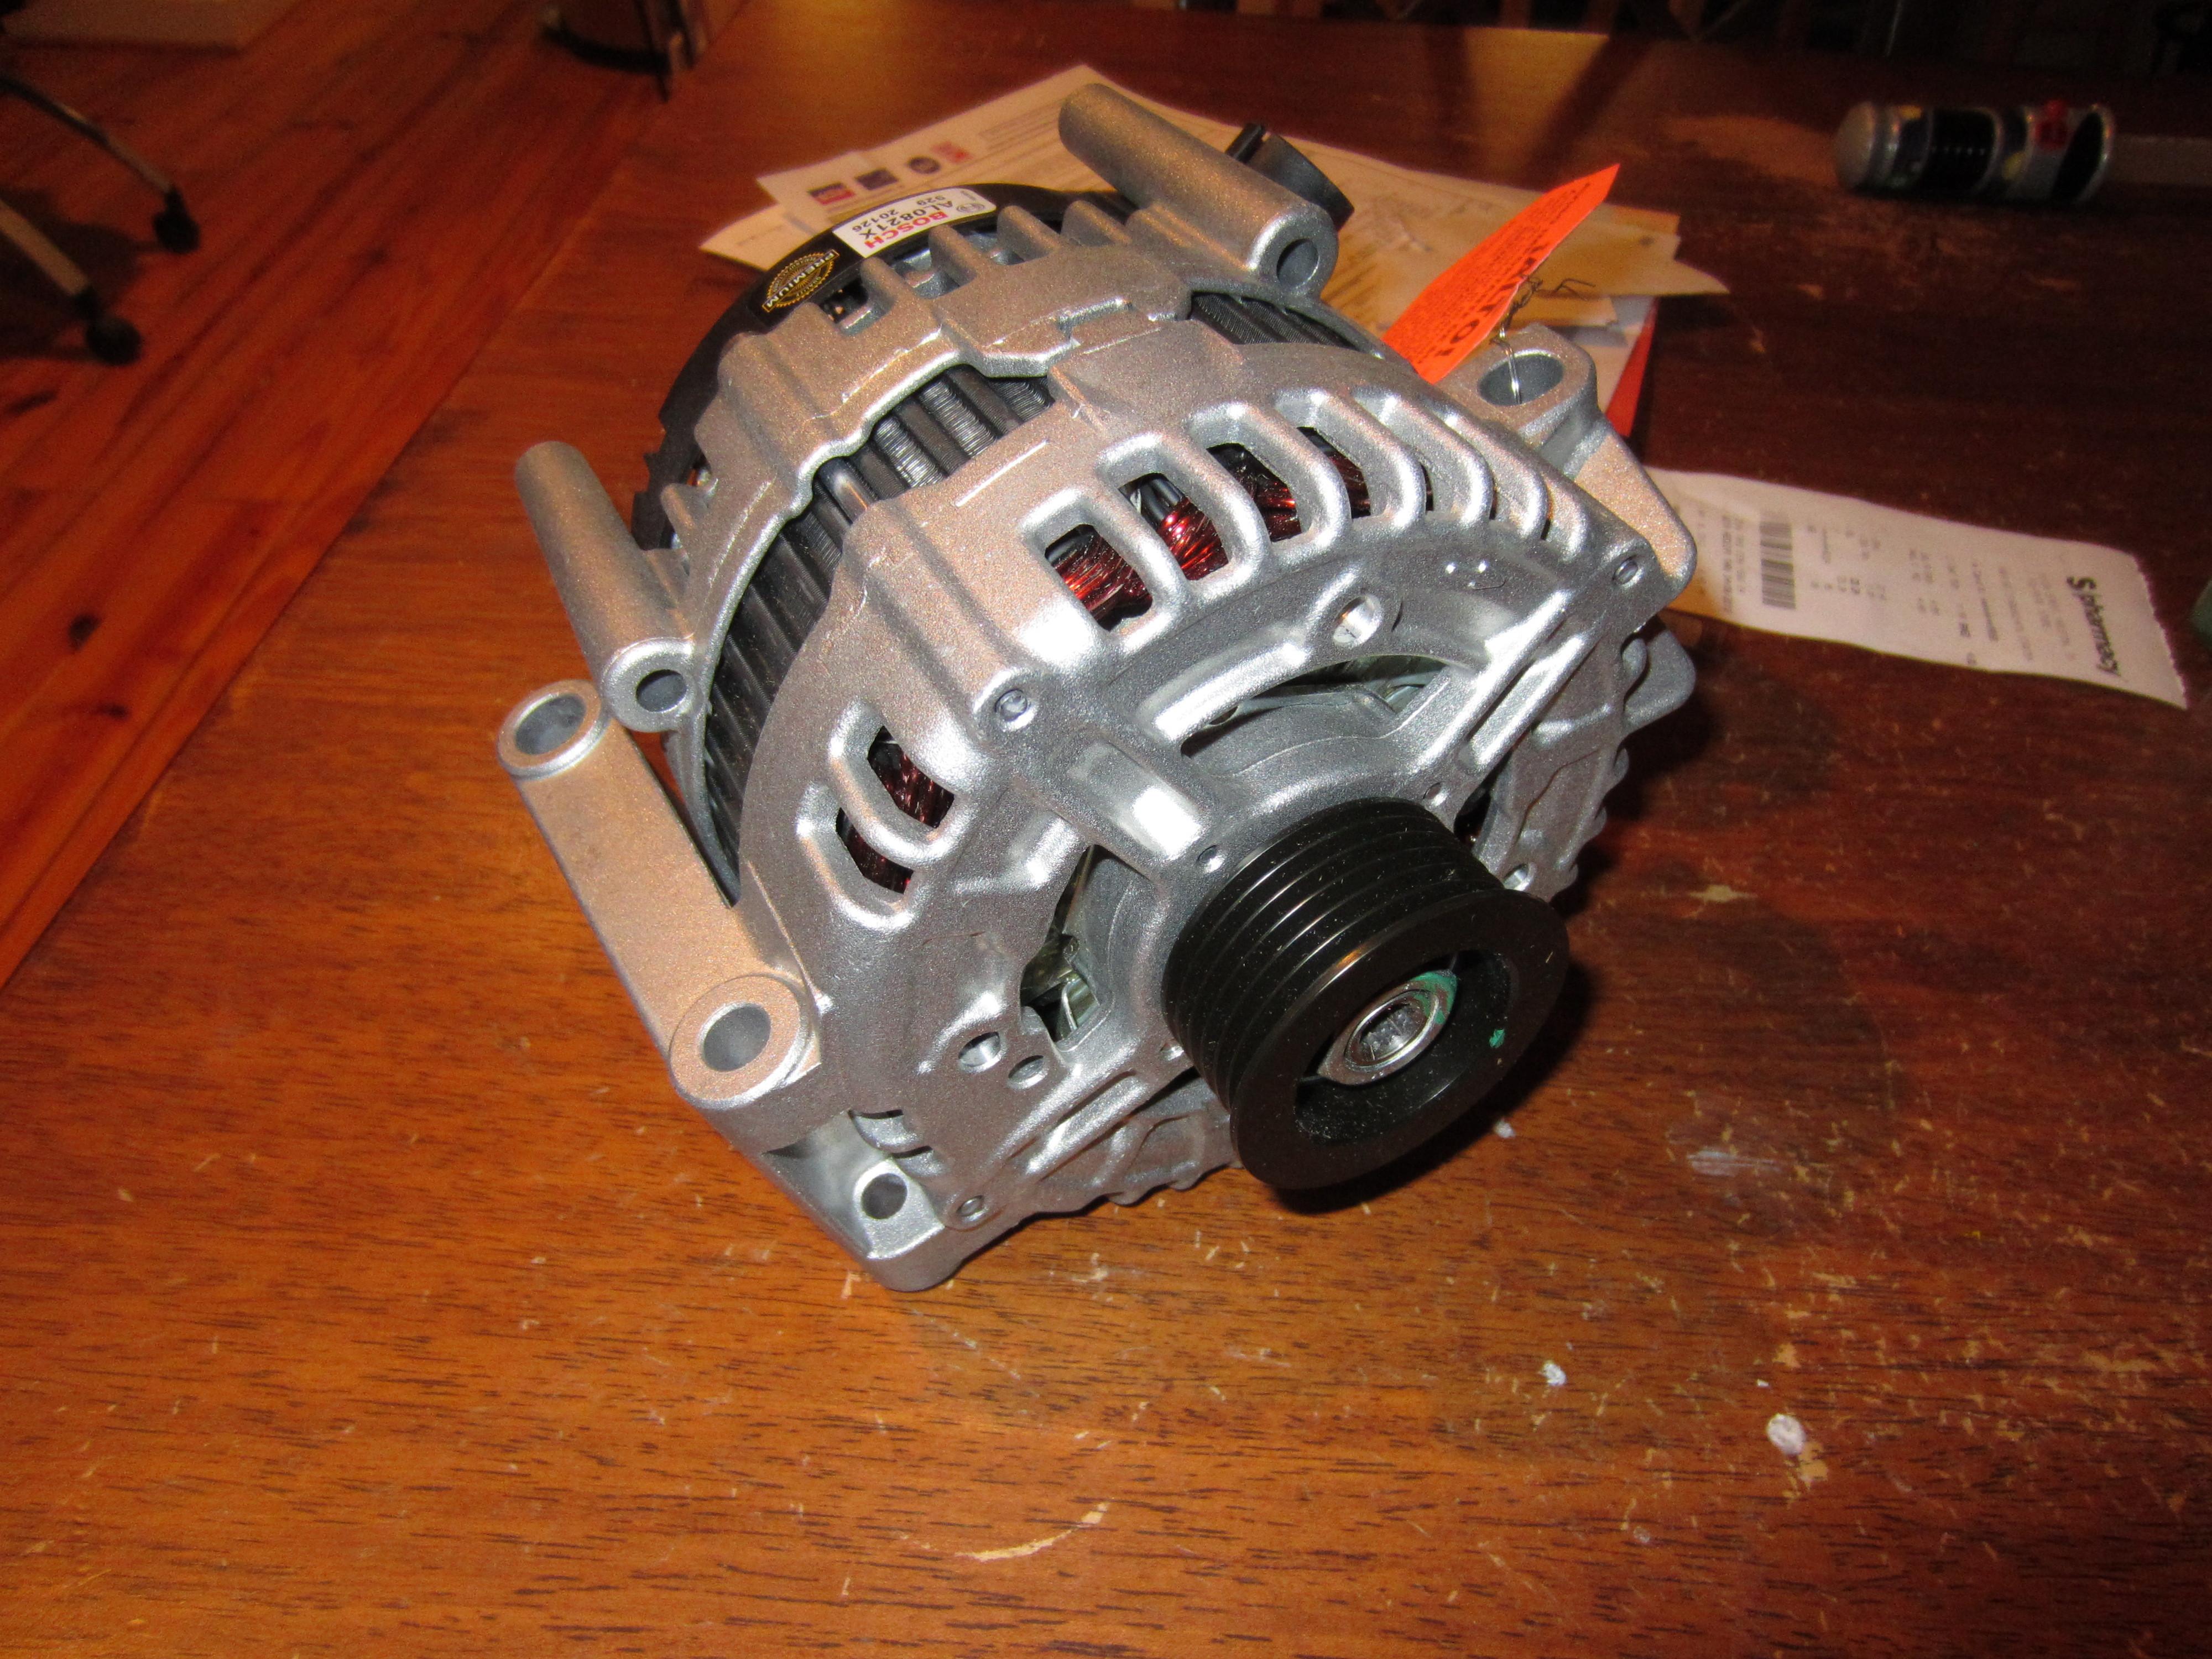 Lets change an alternator in a V8 Volvo XC90! - General [M]ayhem